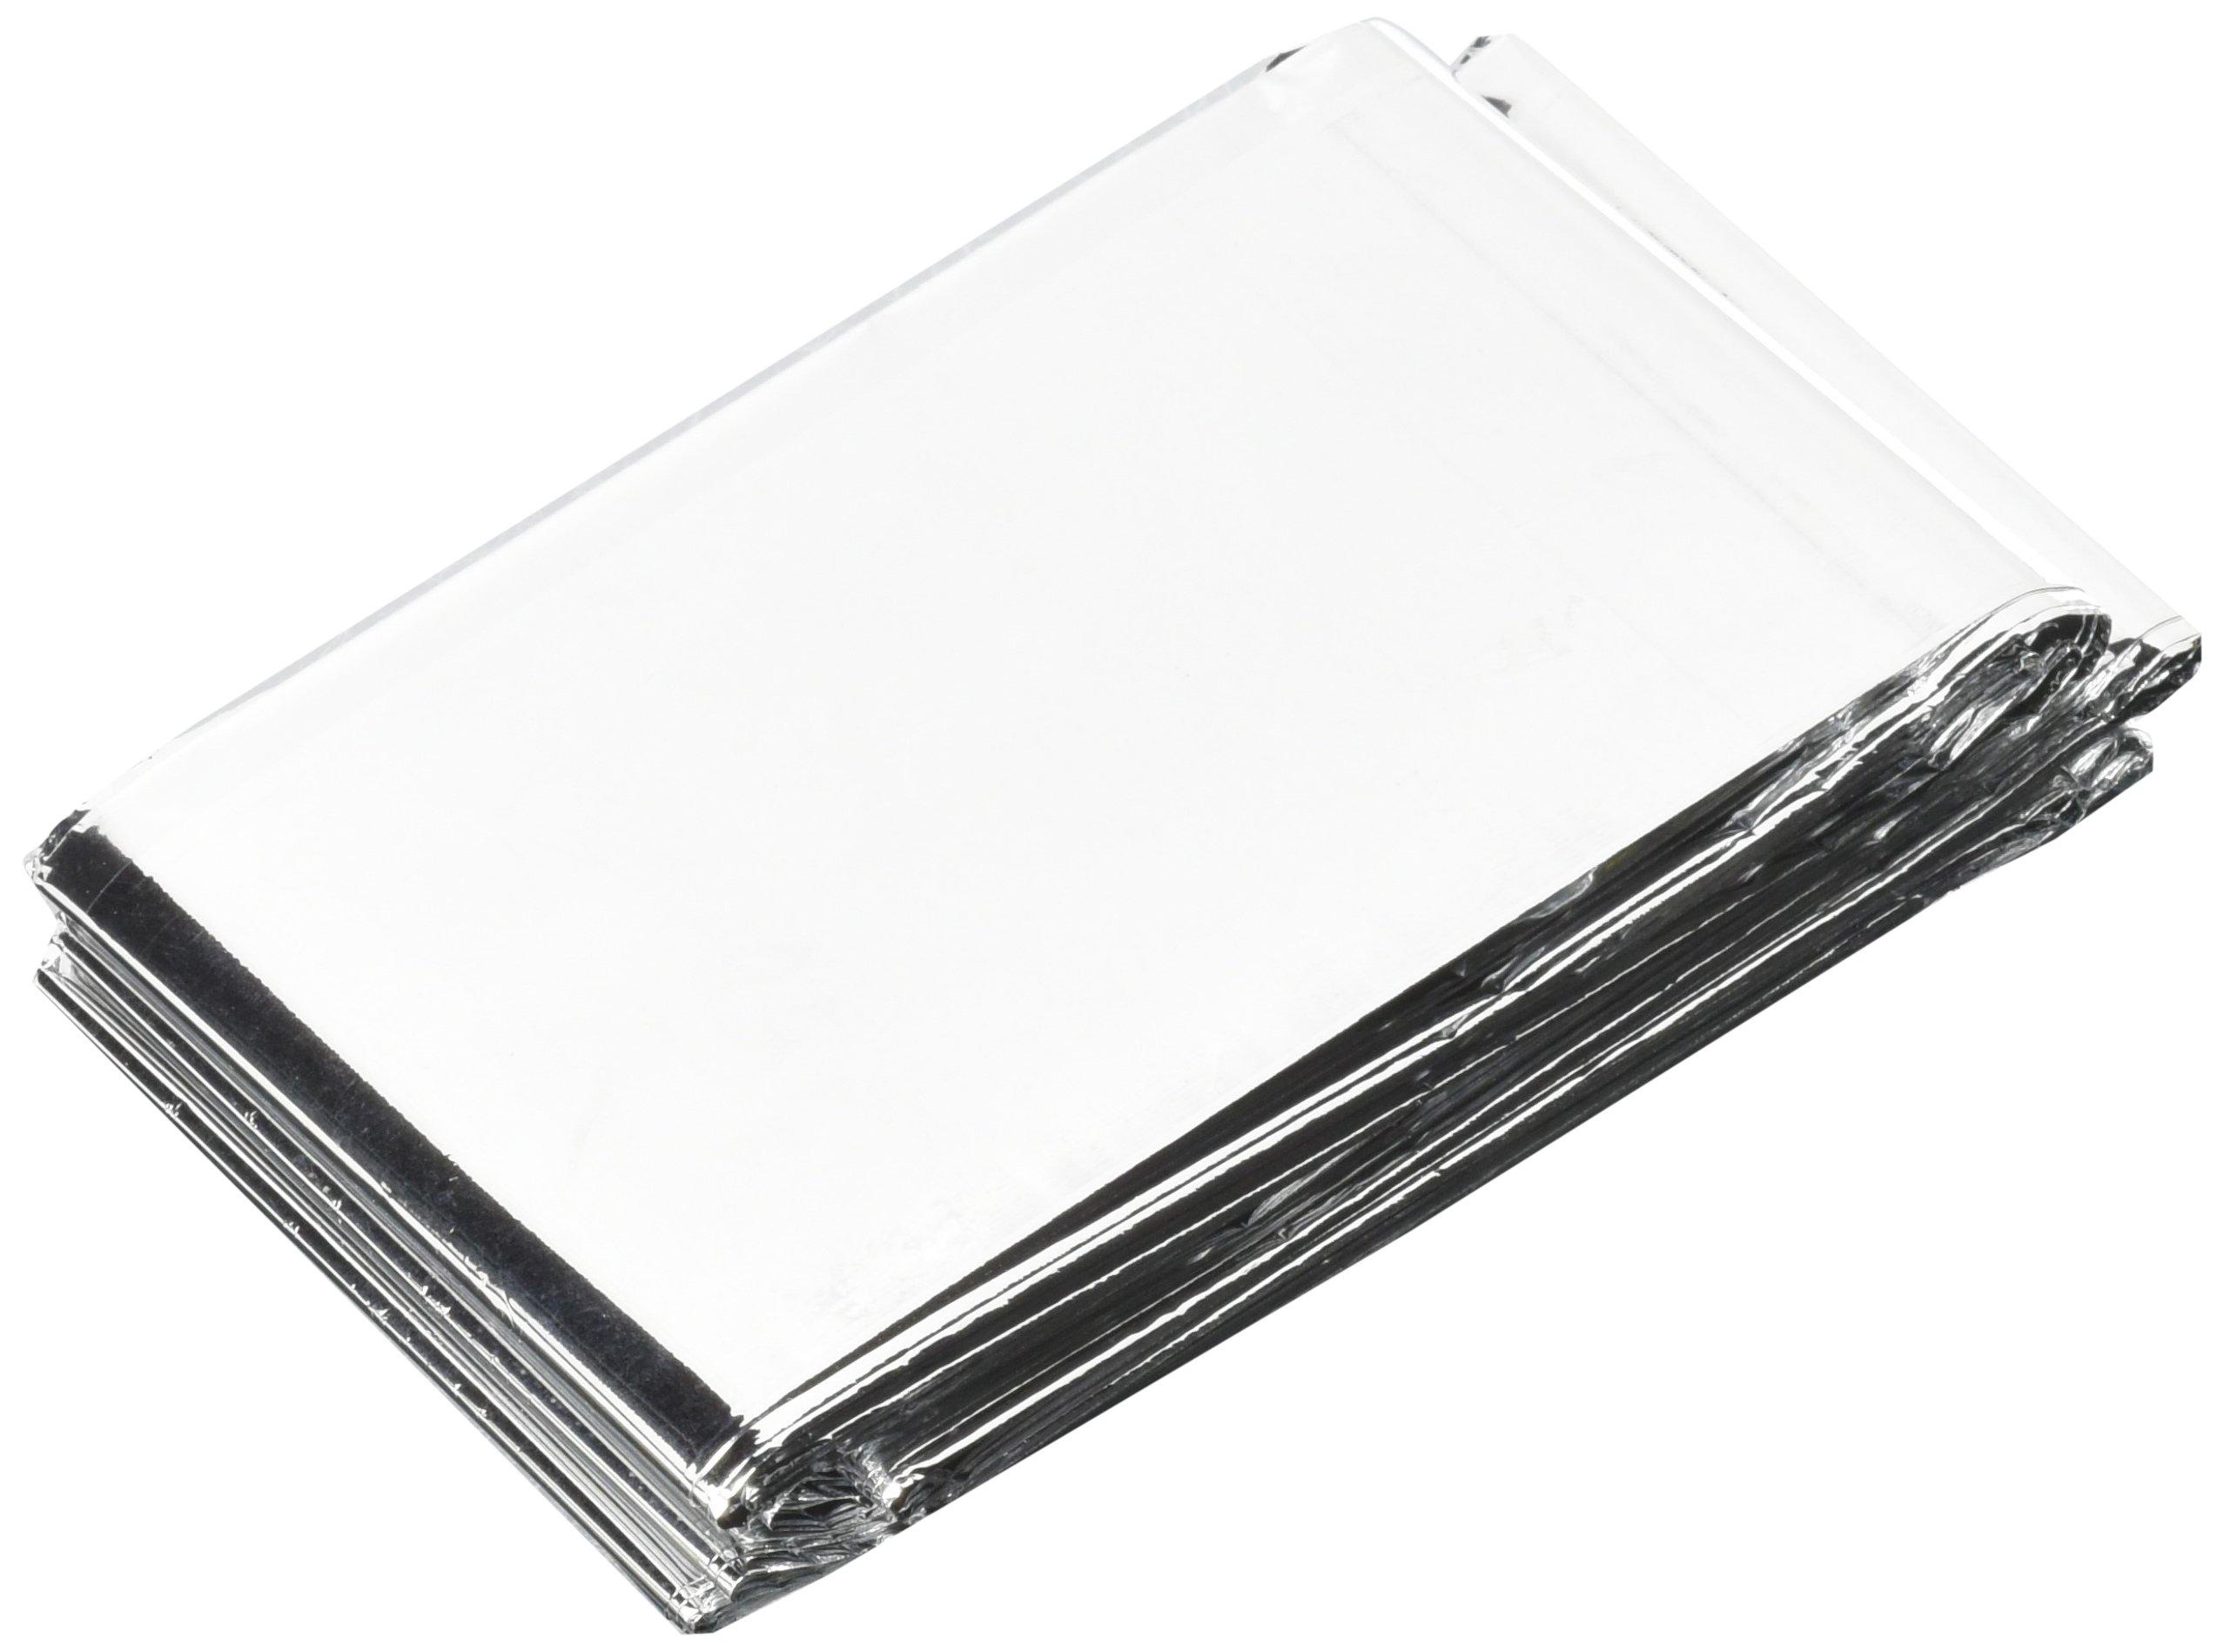 Mocase Outdoor Emergency Rescure Blanket Solar Thermal Space Mylar Blanket 5pcs Silver